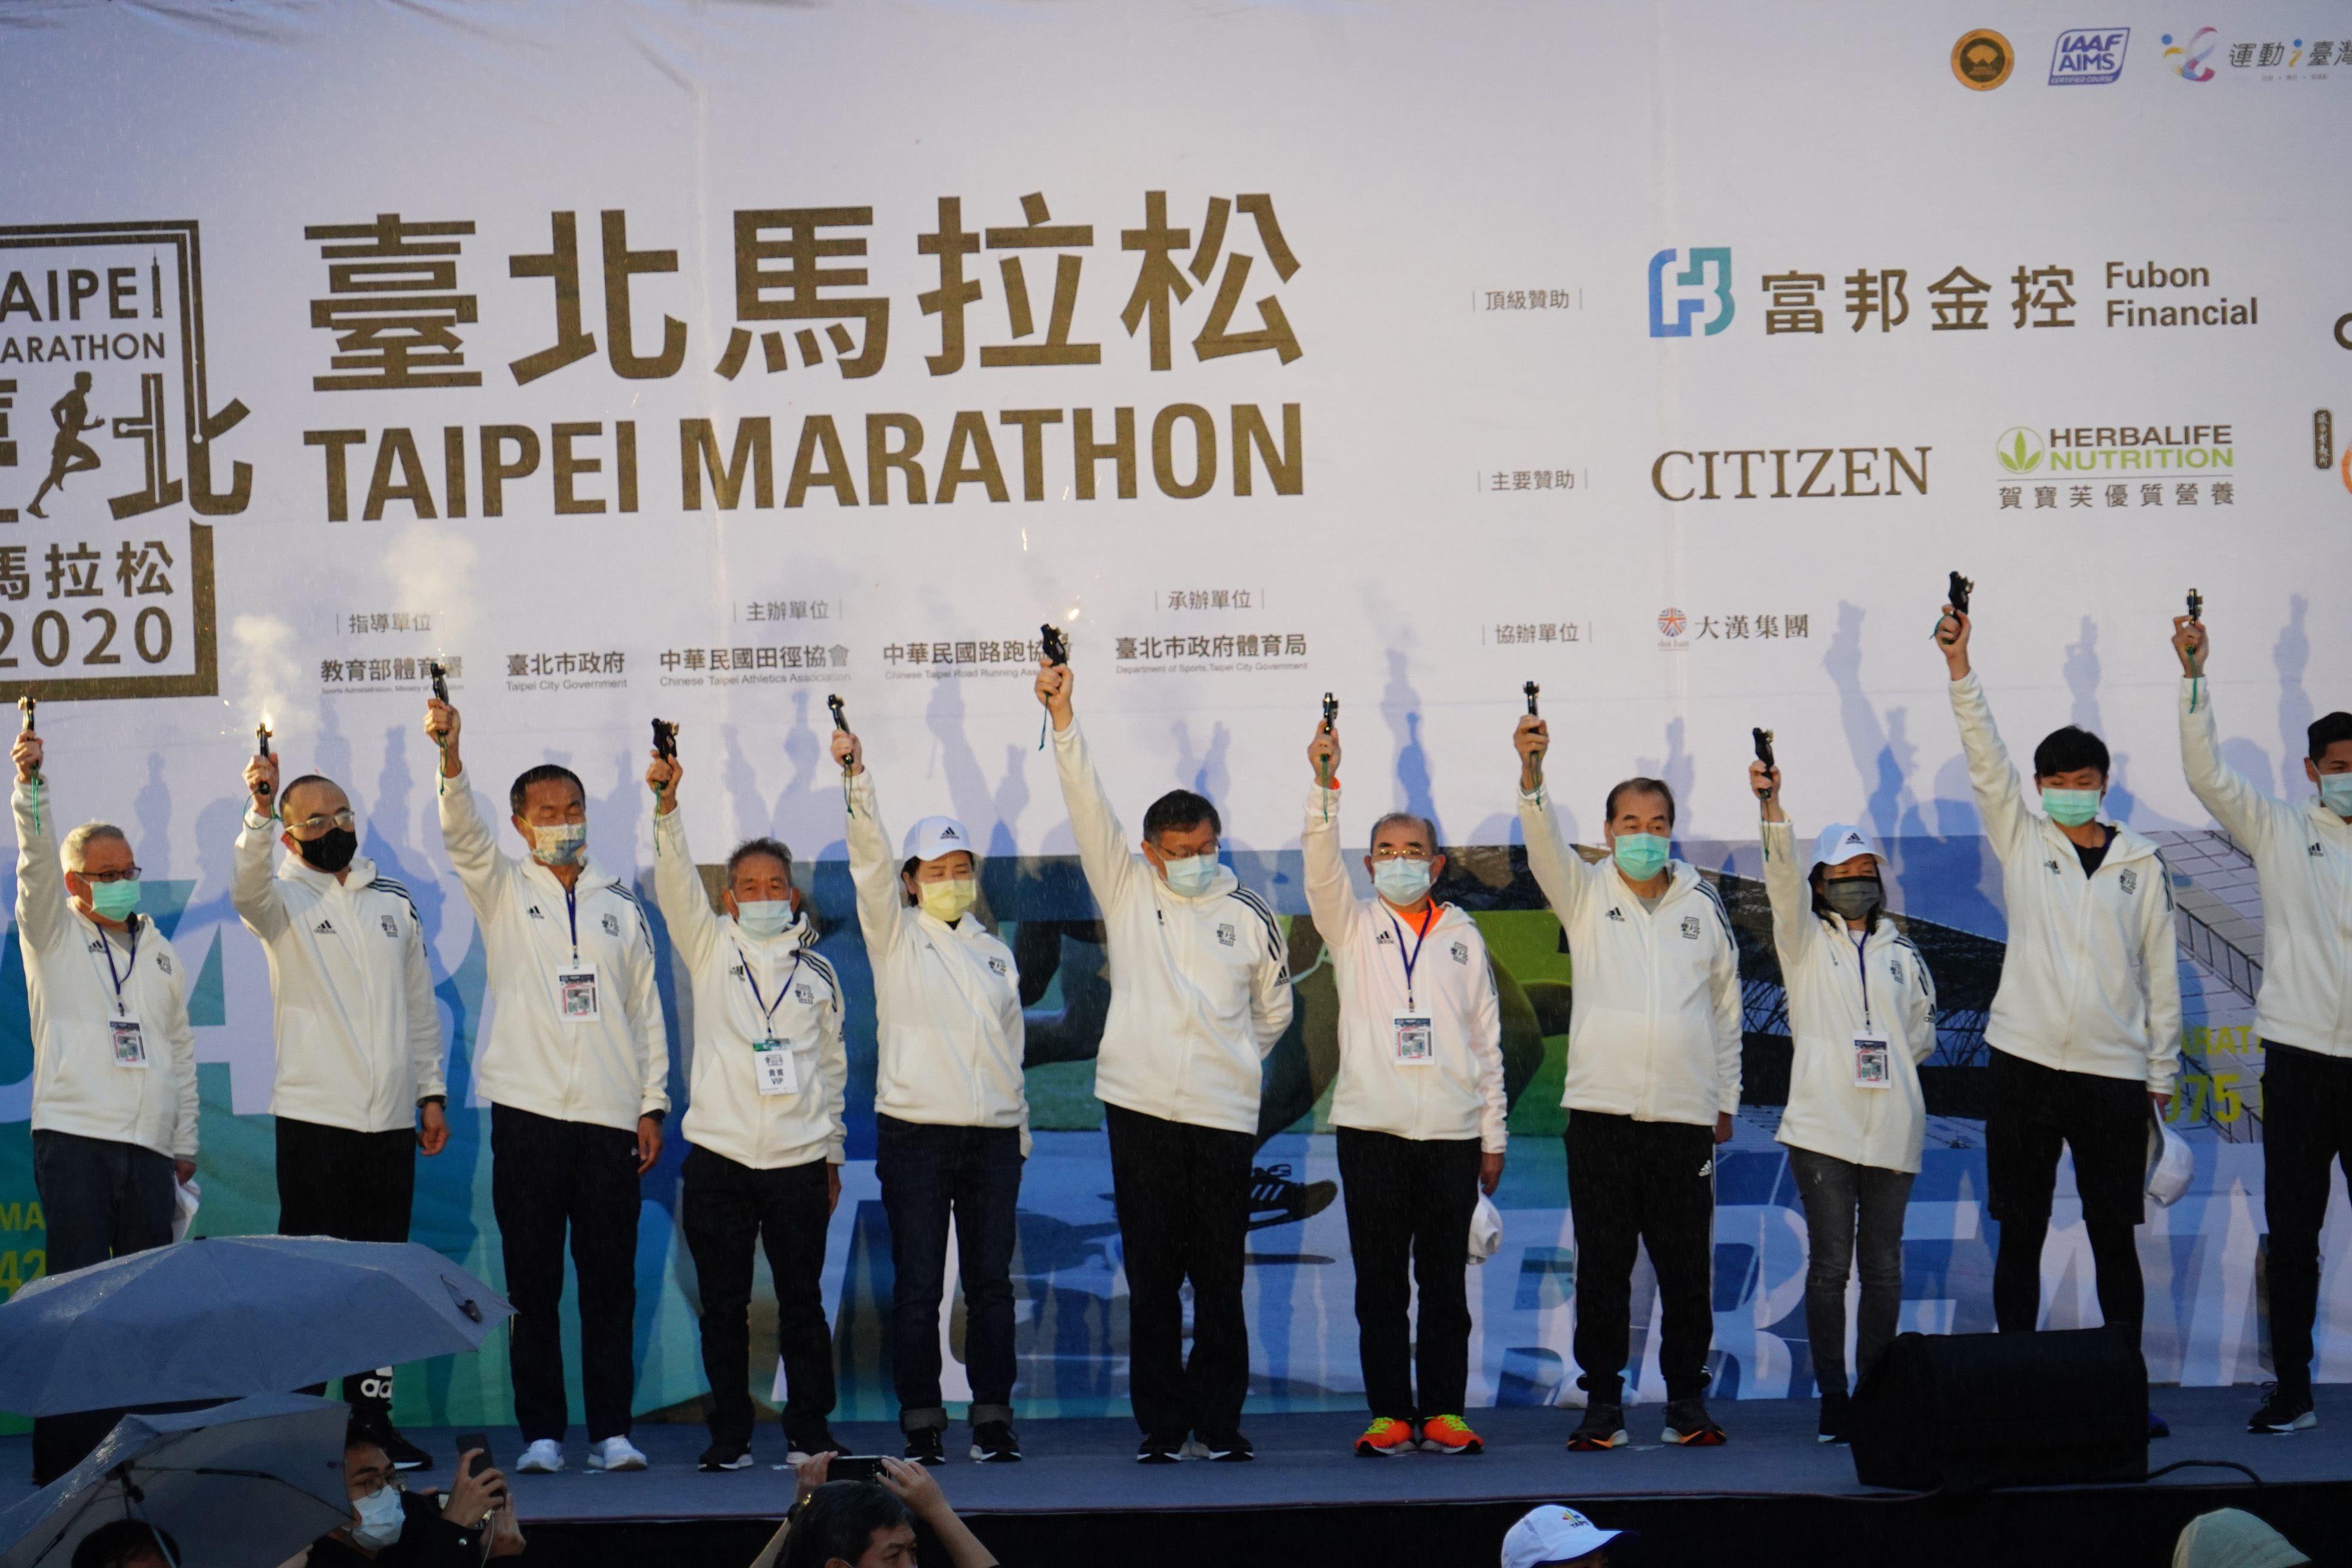 Mayor Ko fires the running pistol, kicking off this year's Taipei Marathon